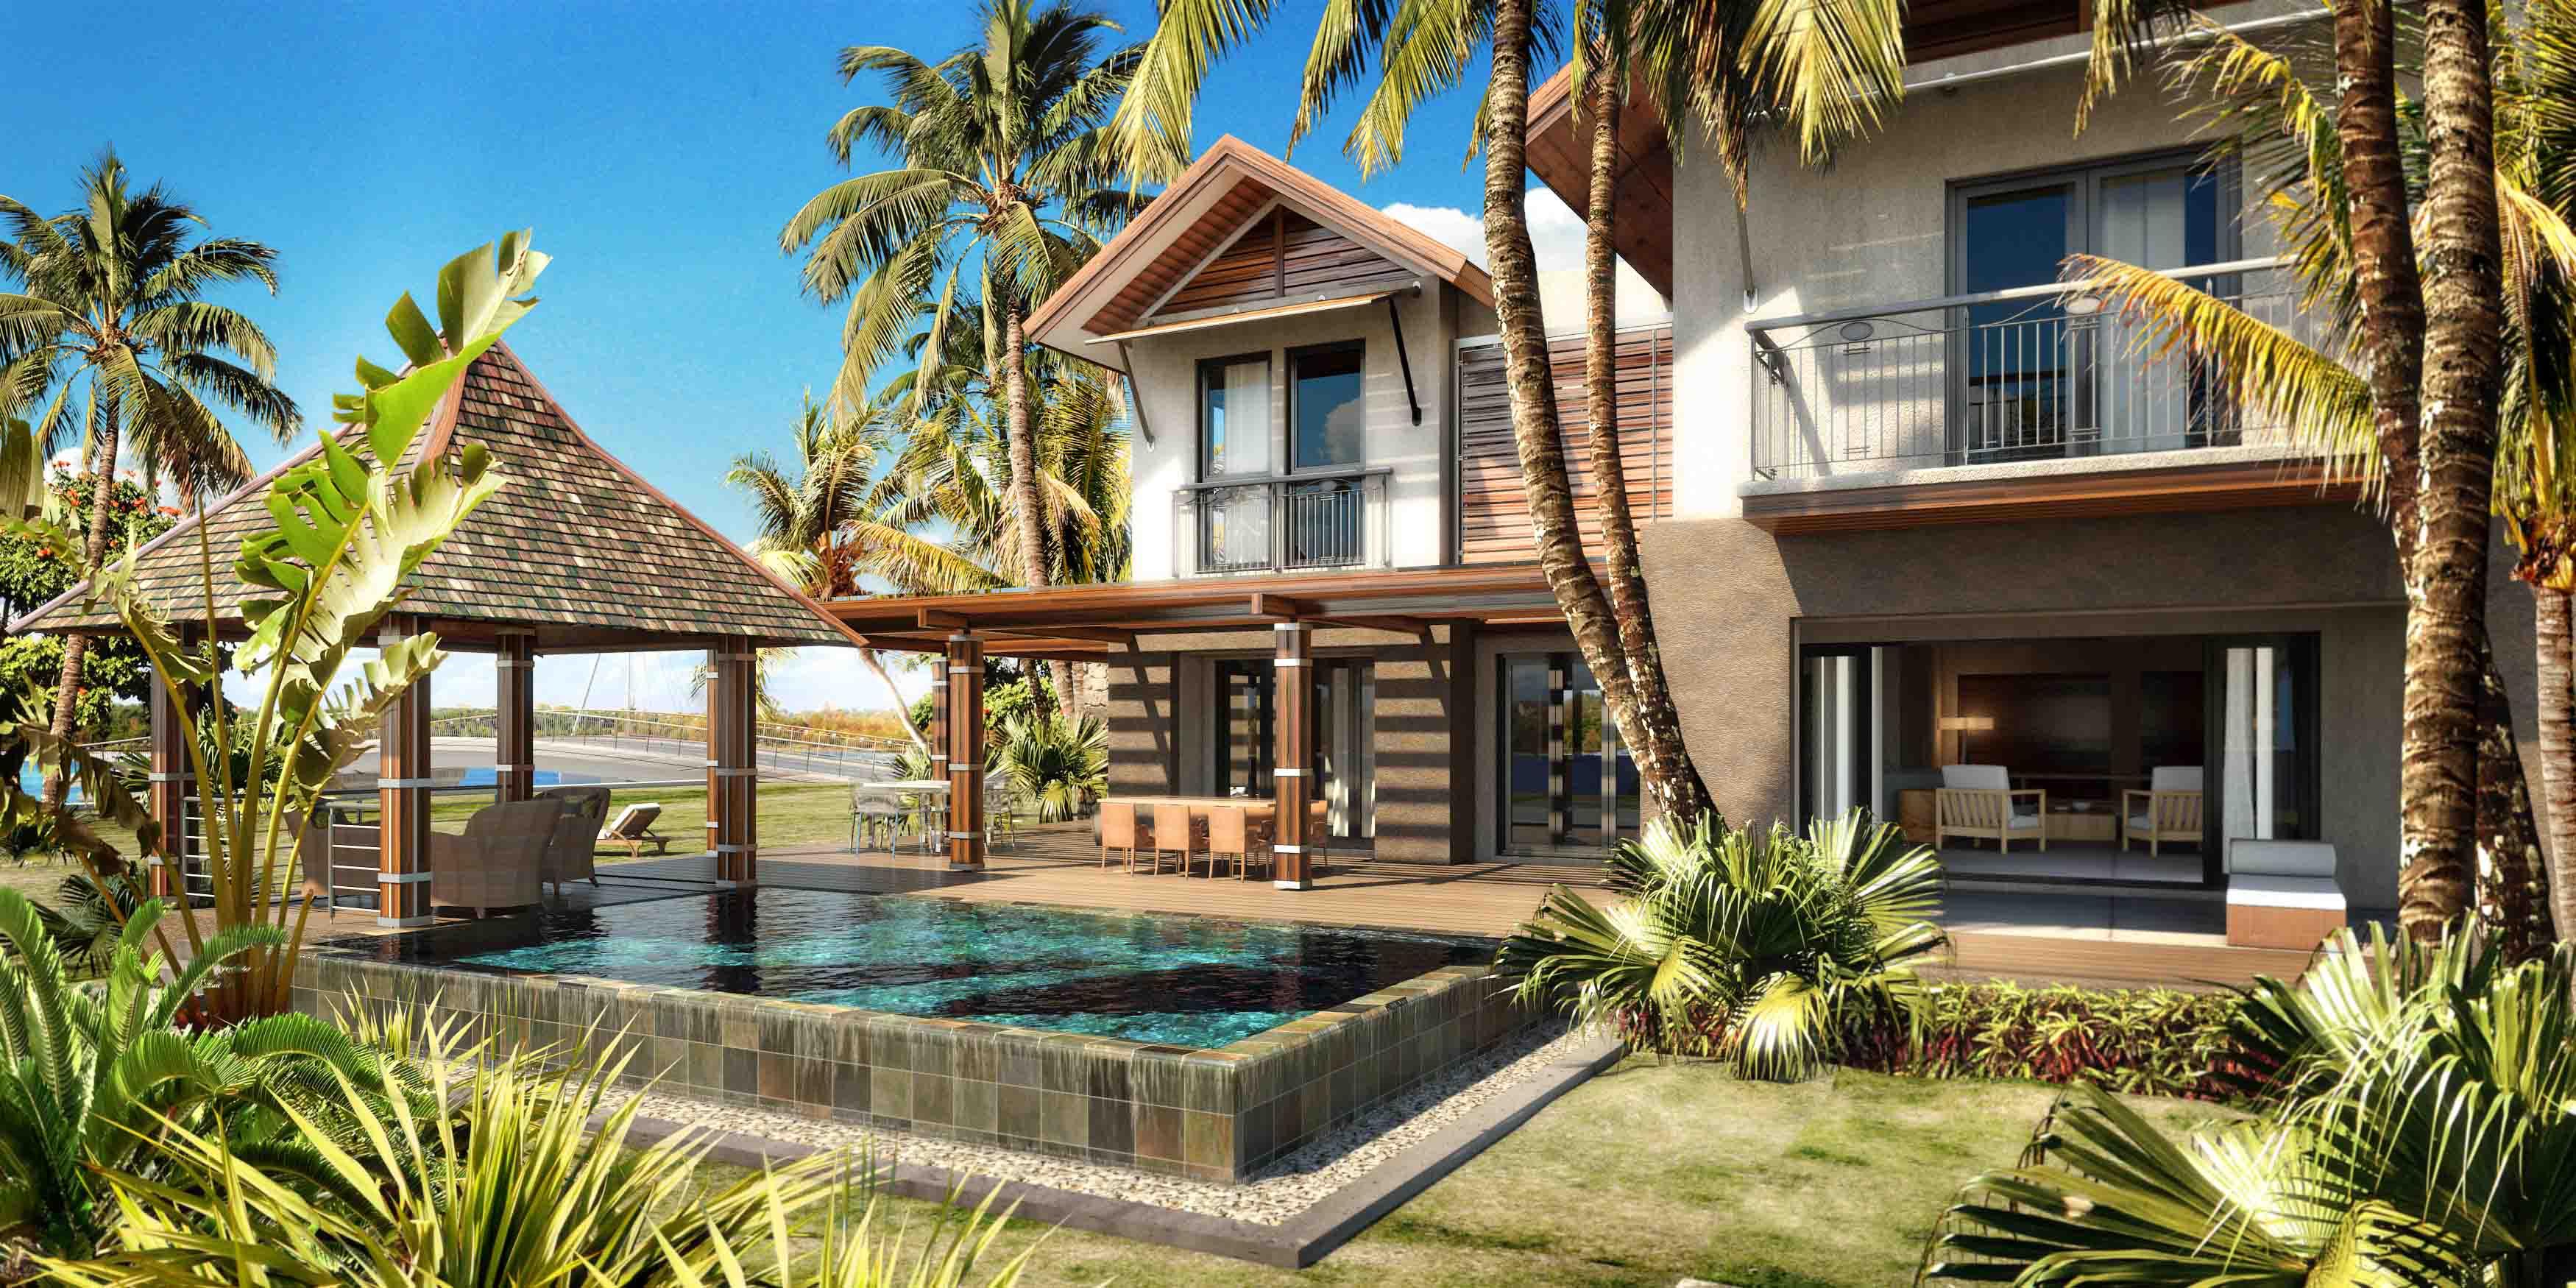 acheter une maison l ile maurice avie home